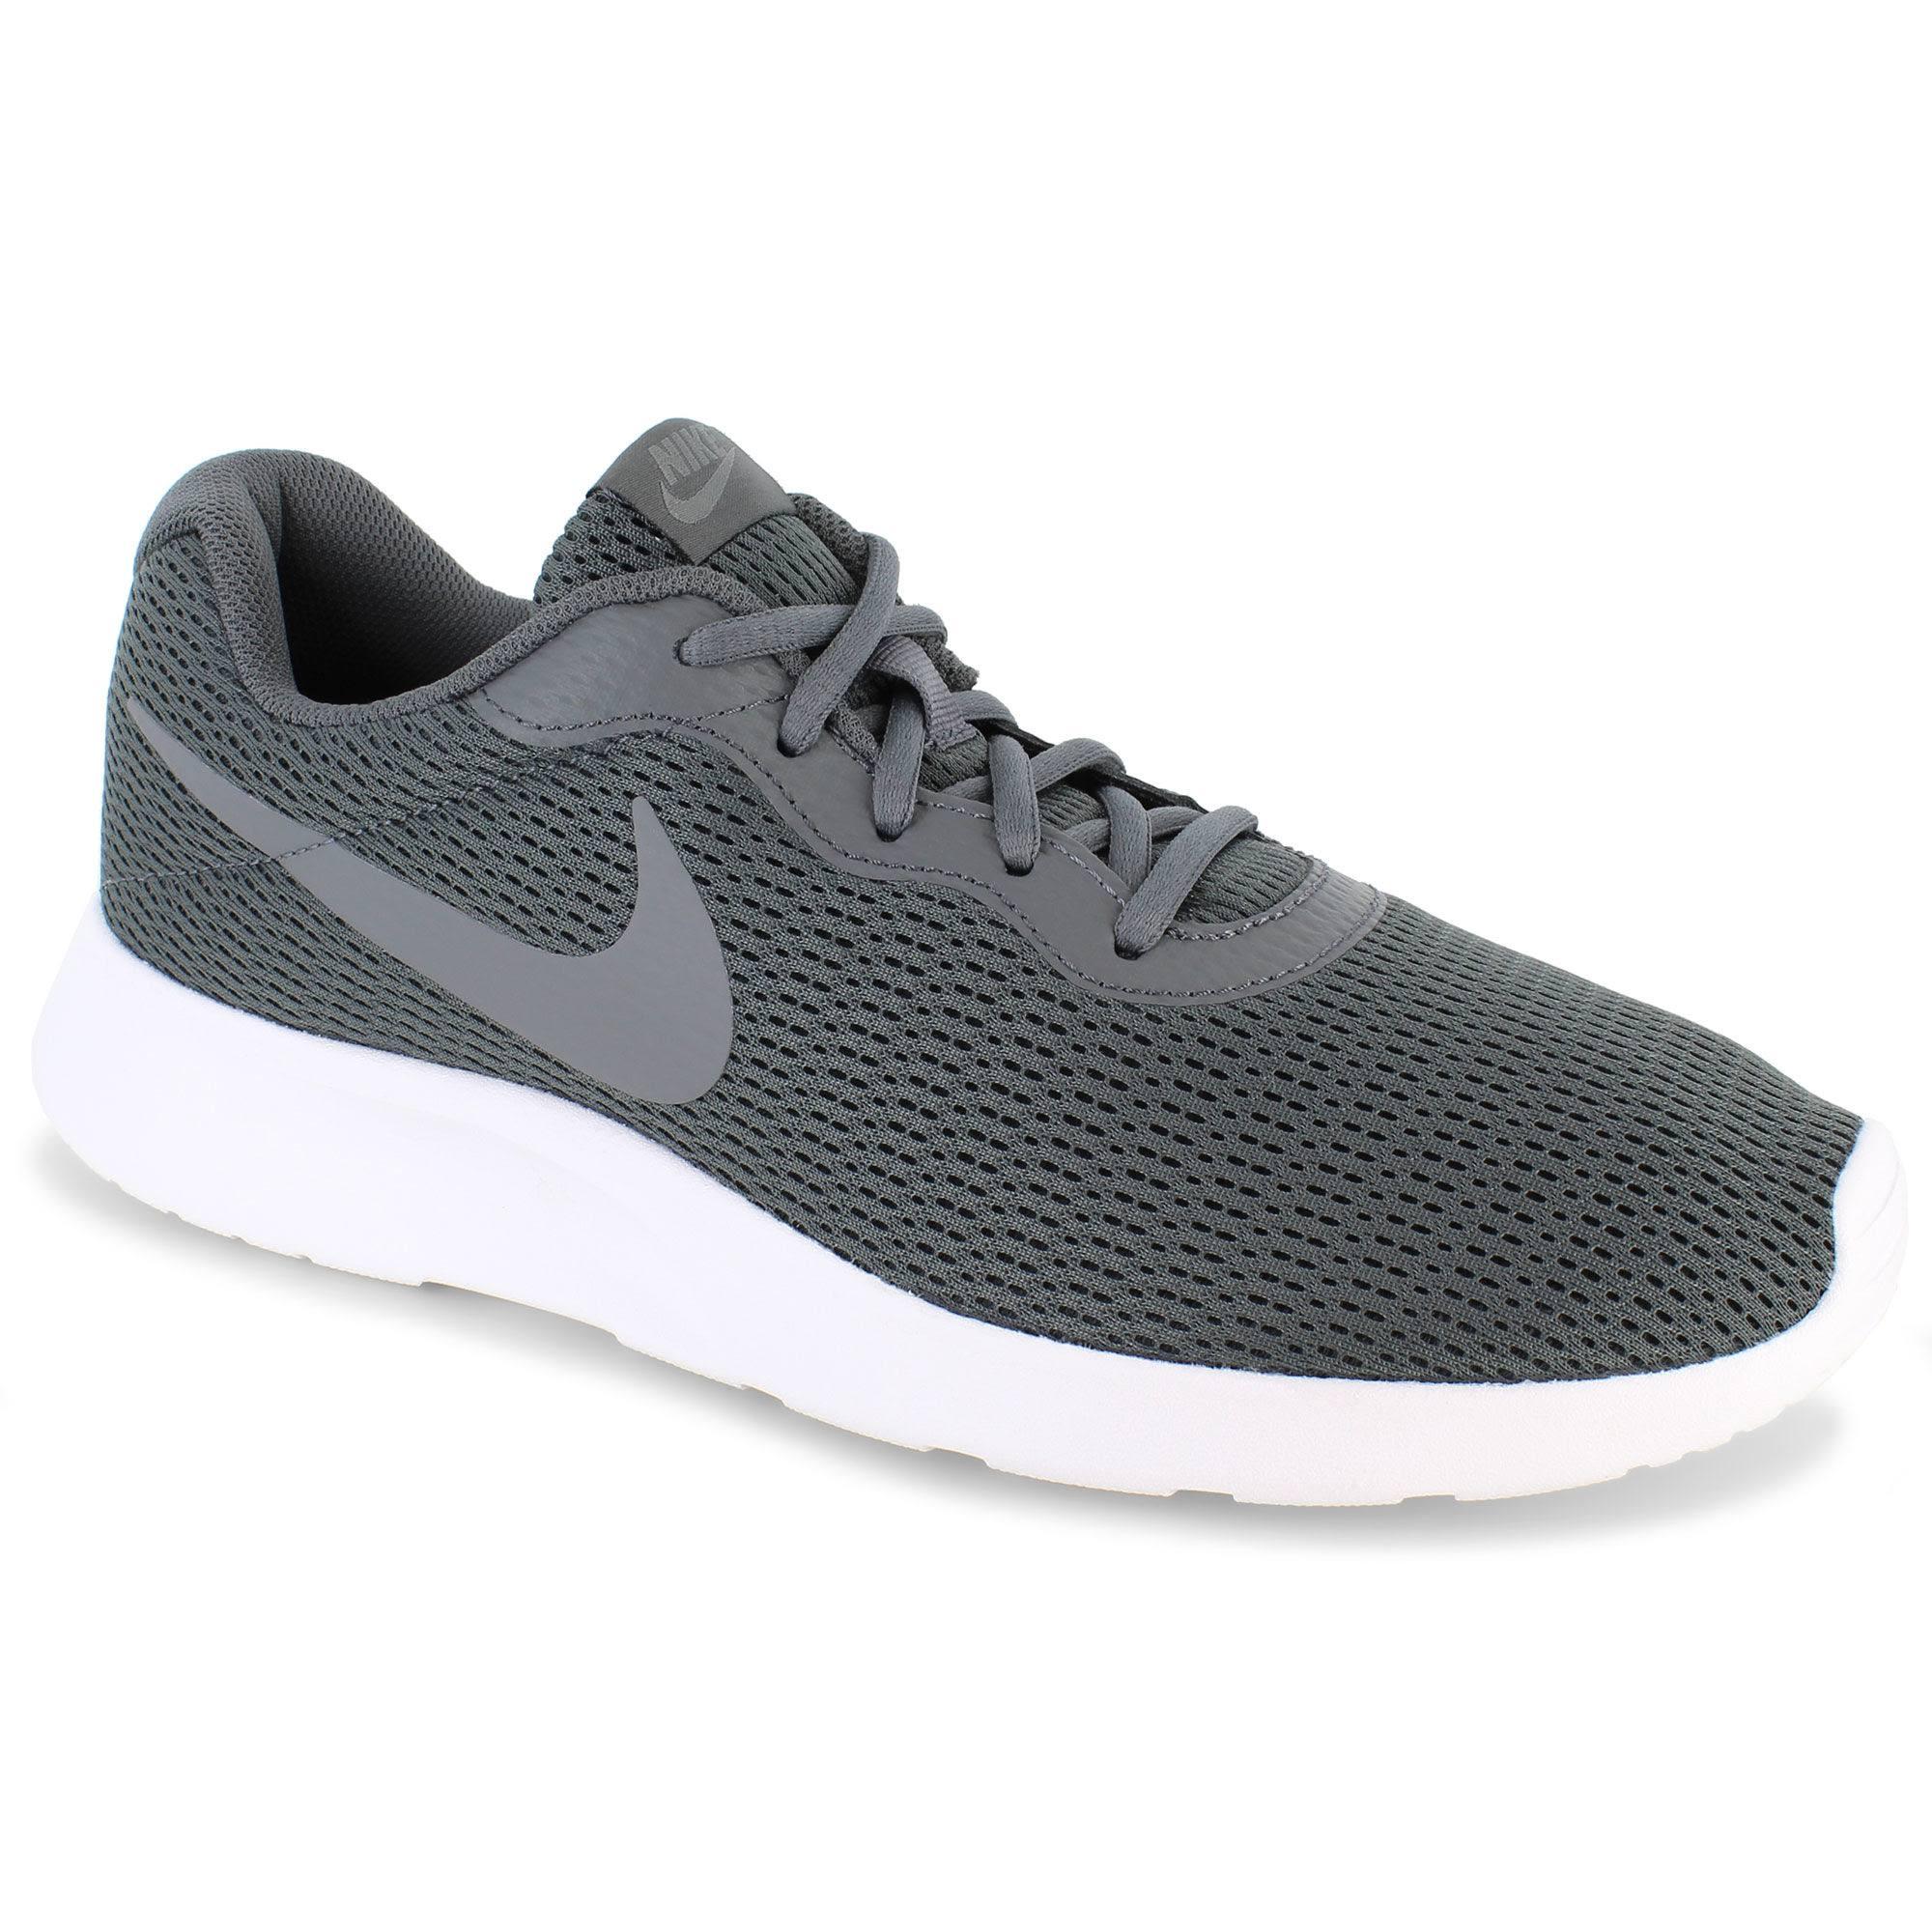 Tanjun Scarpa Running Nike Uomo Da erxCBdo